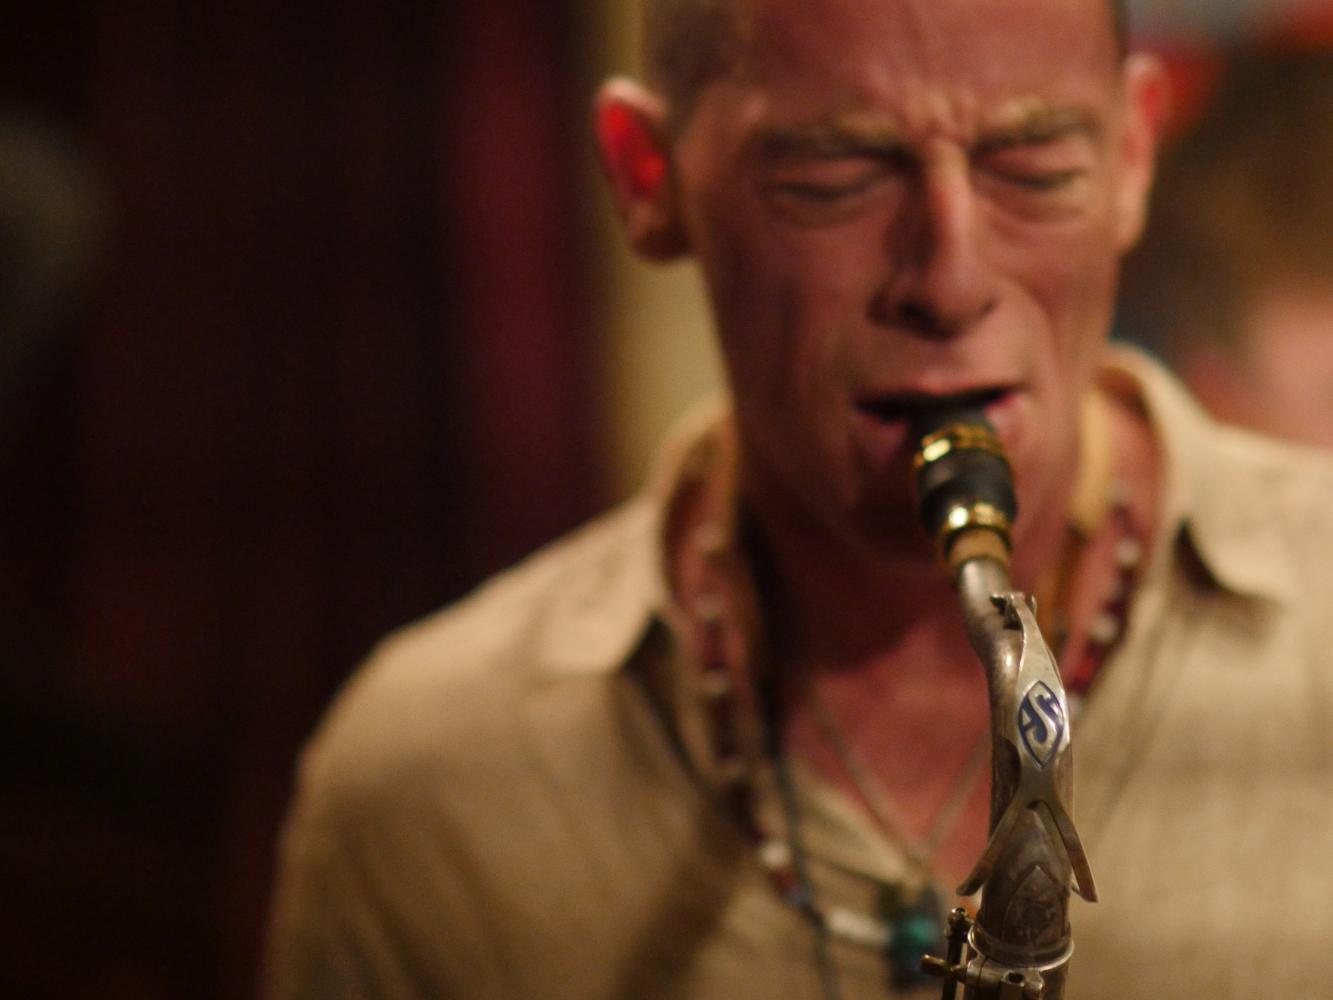 Mark Fox - Saxophones, Kamal Ngoni, Composer, Bandleader